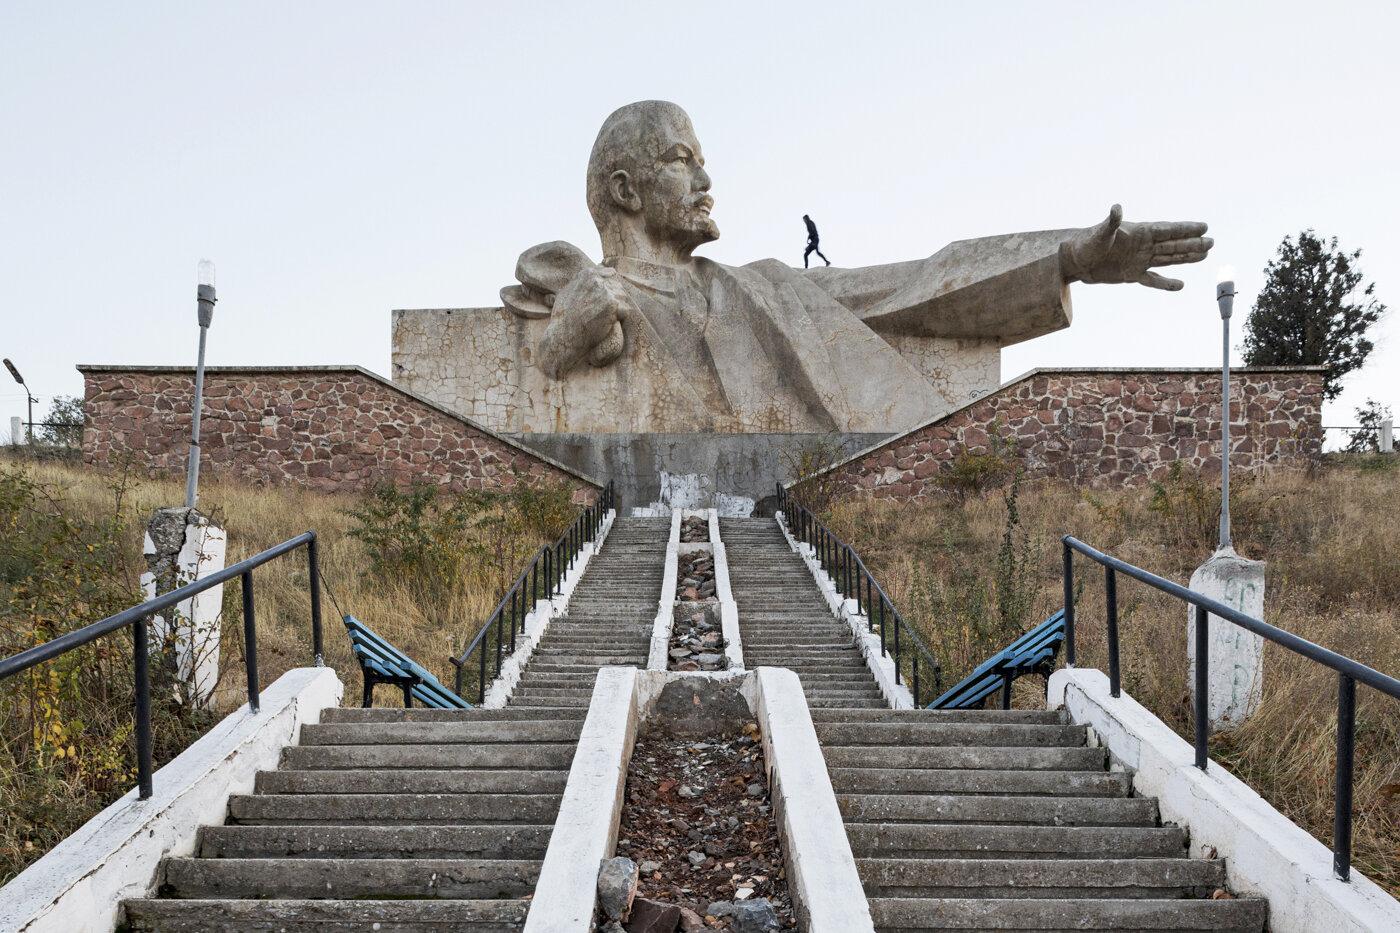 Lenin monument (1965). Istaravshan, Tajikistan. Photo: Stefano Perego.